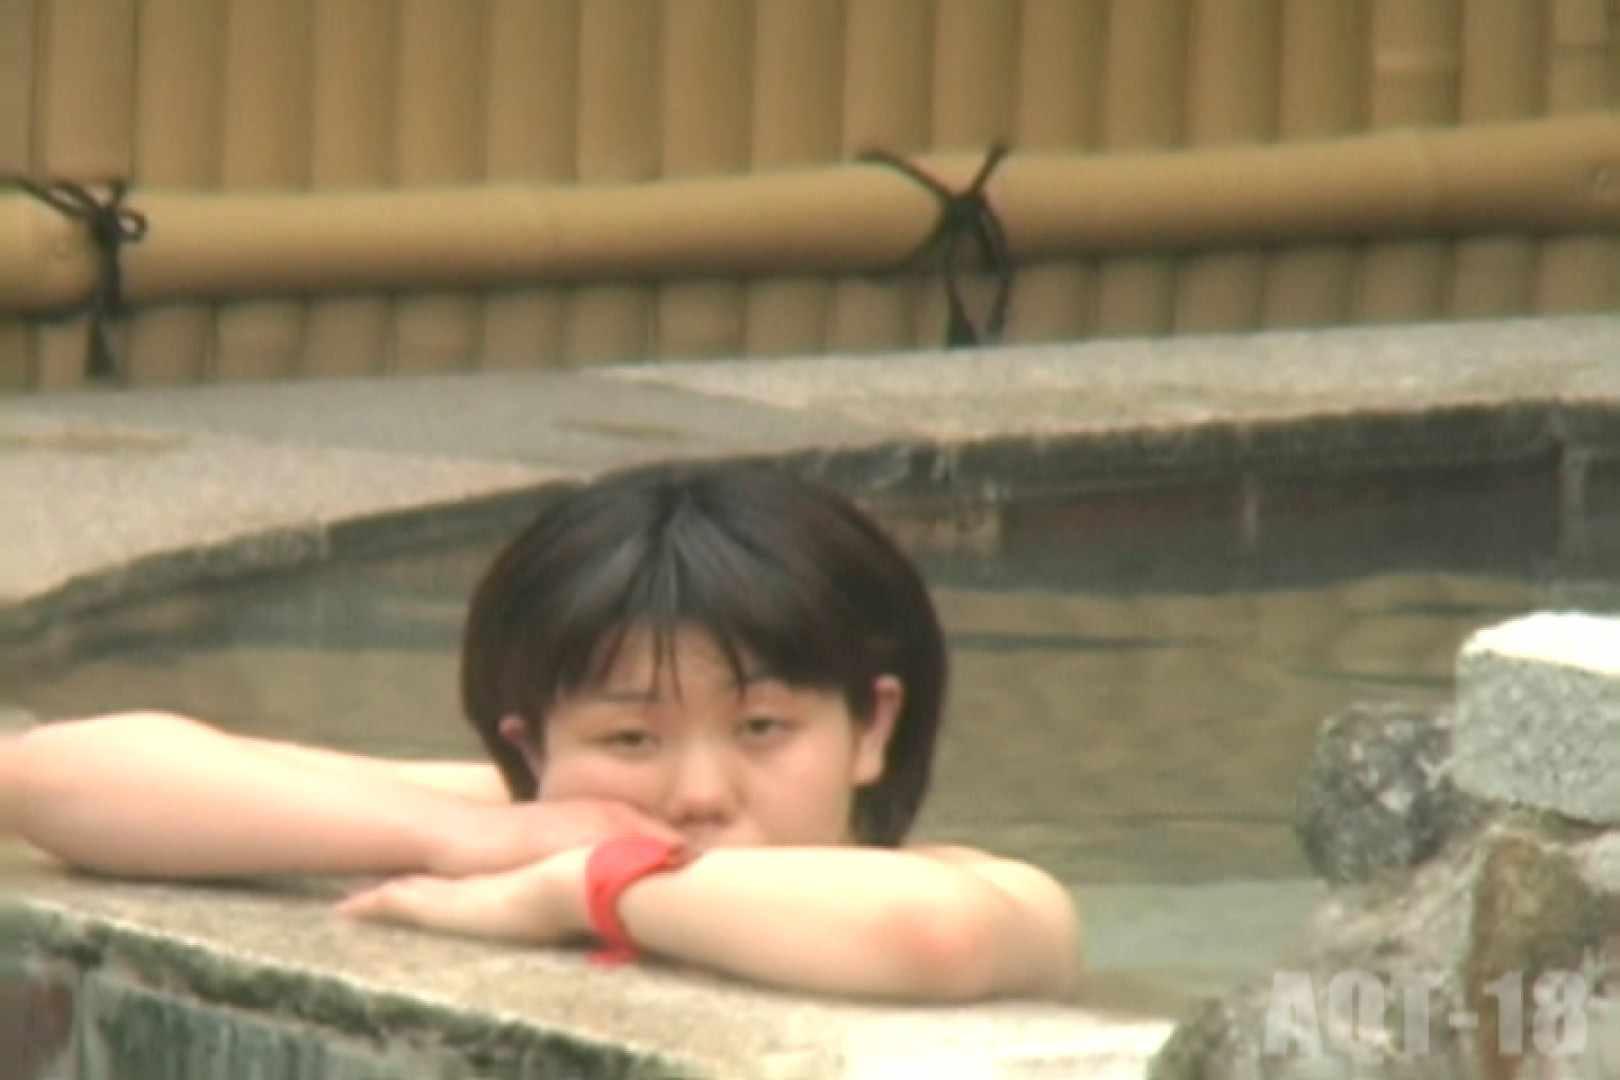 Aquaな露天風呂Vol.861 0  87連発 80